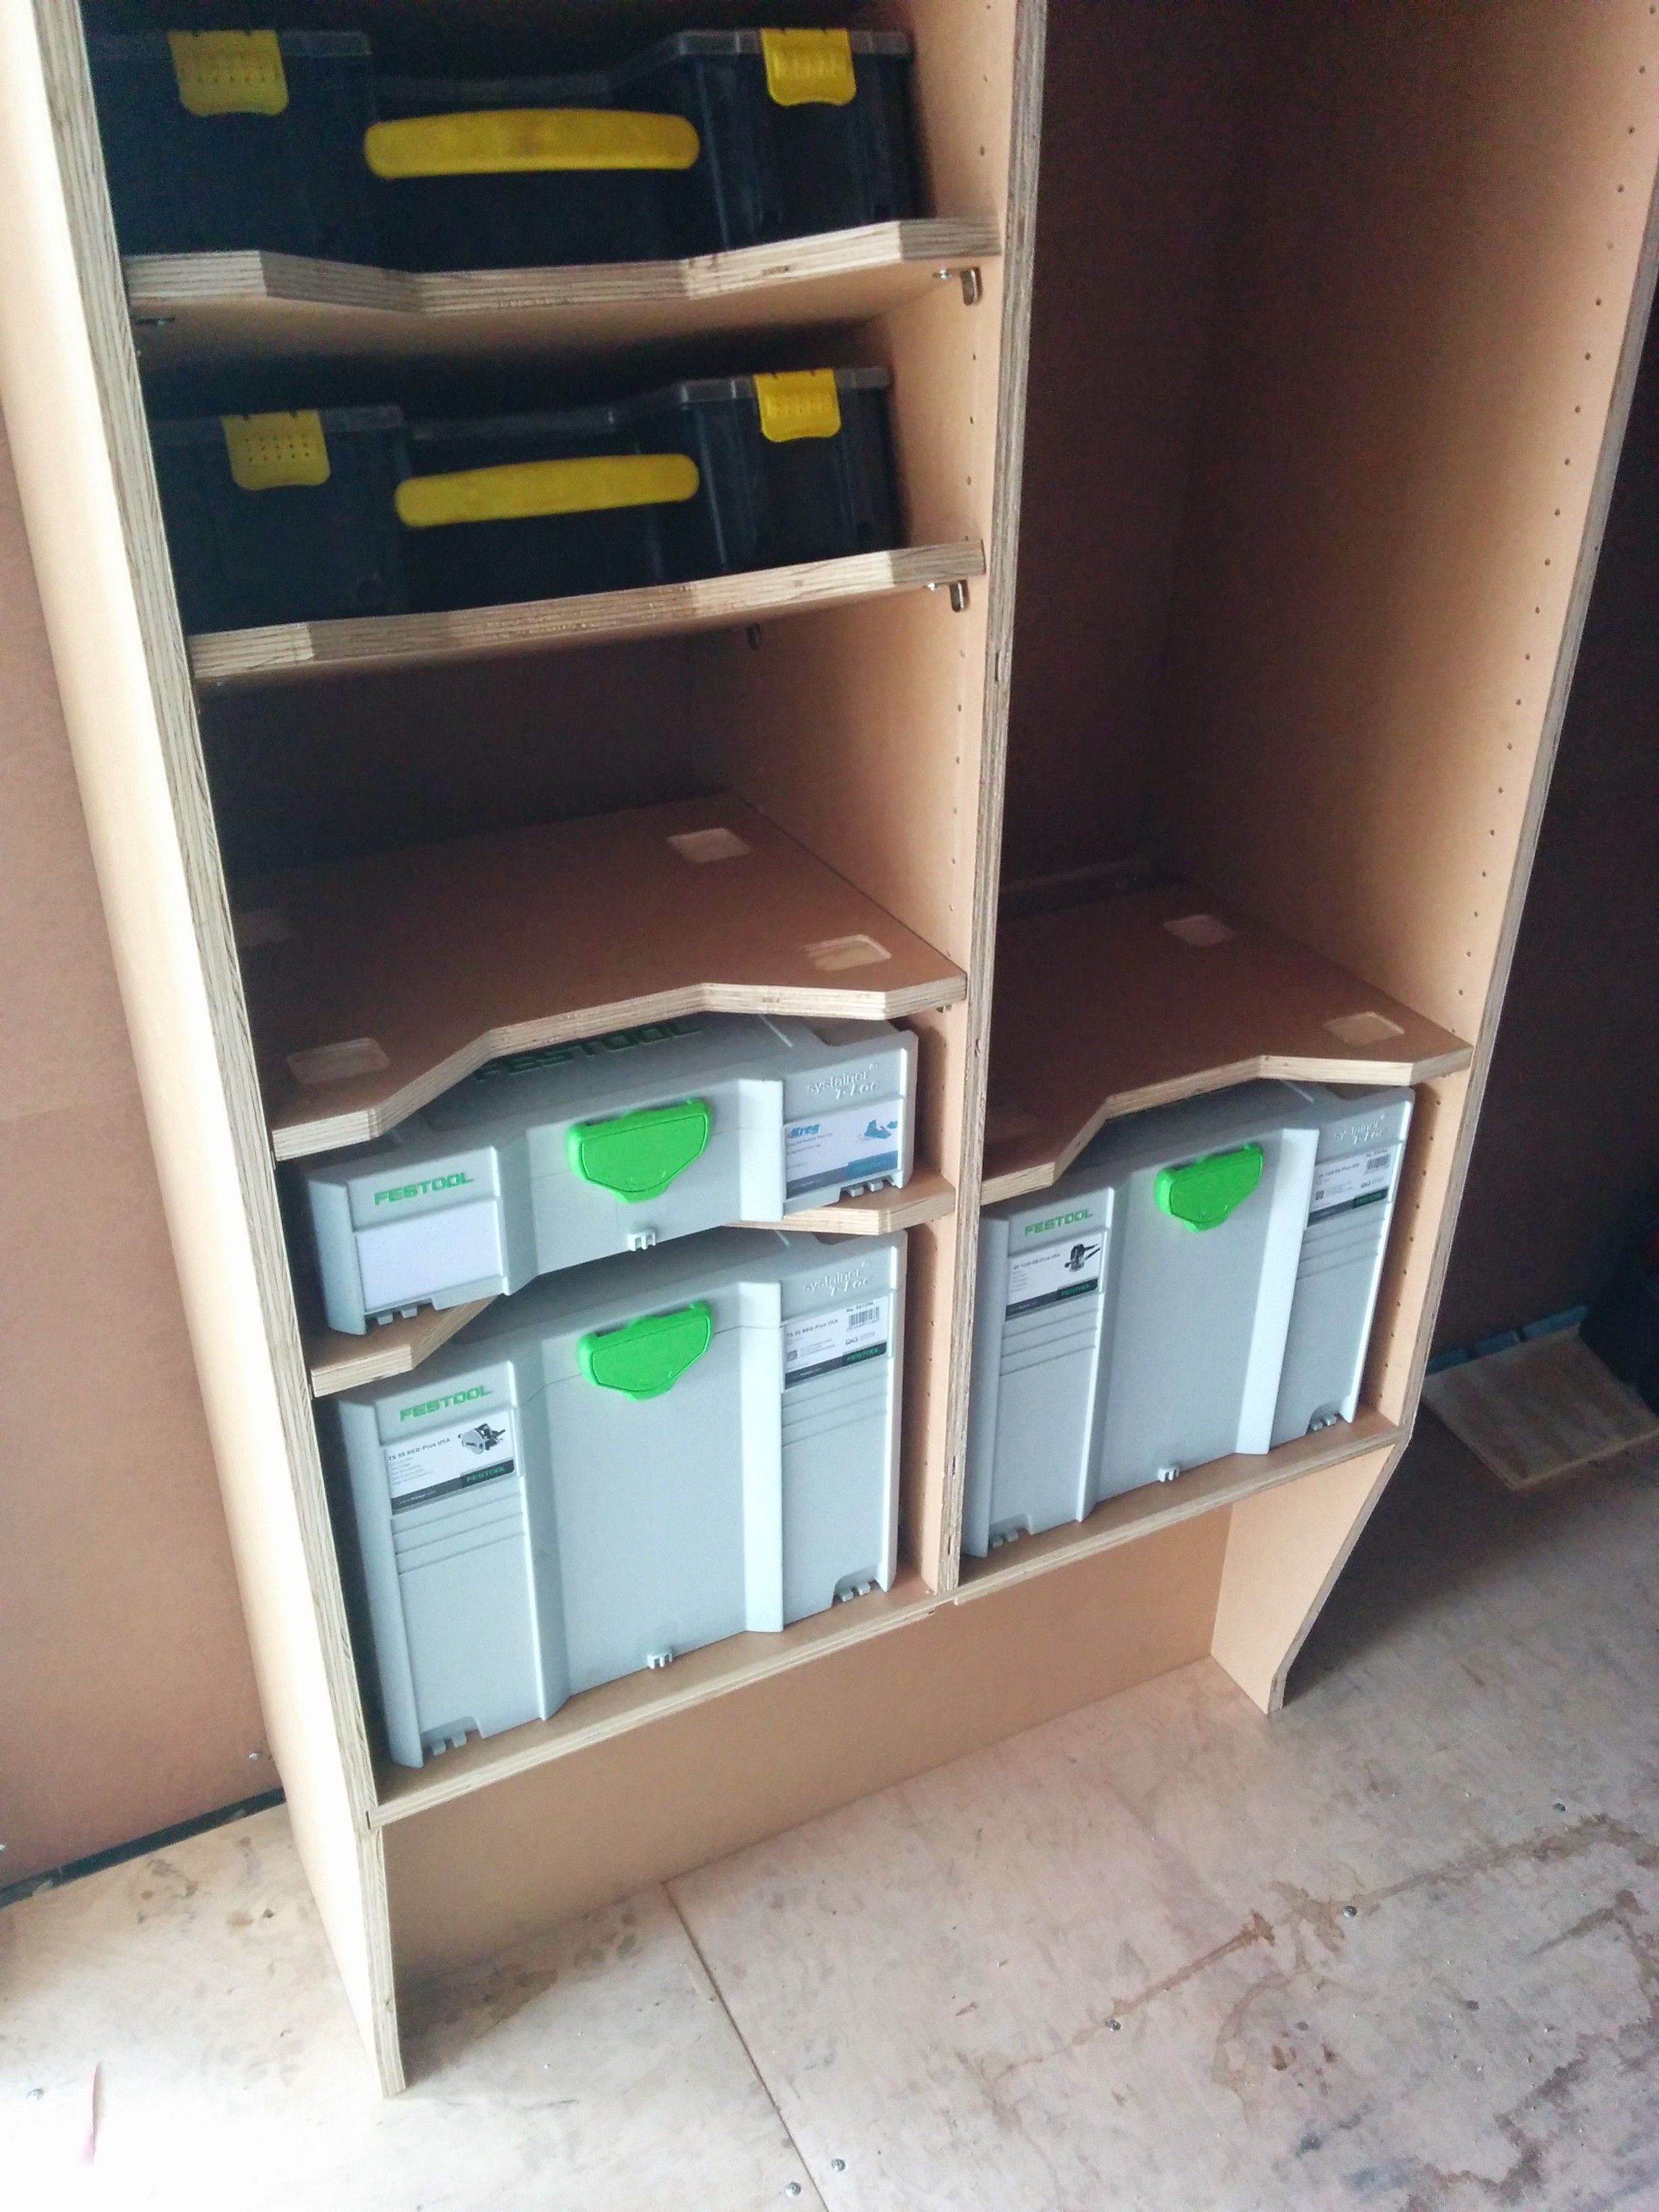 384741 Template For Shelves In Quot Festool Rack Quot For Van